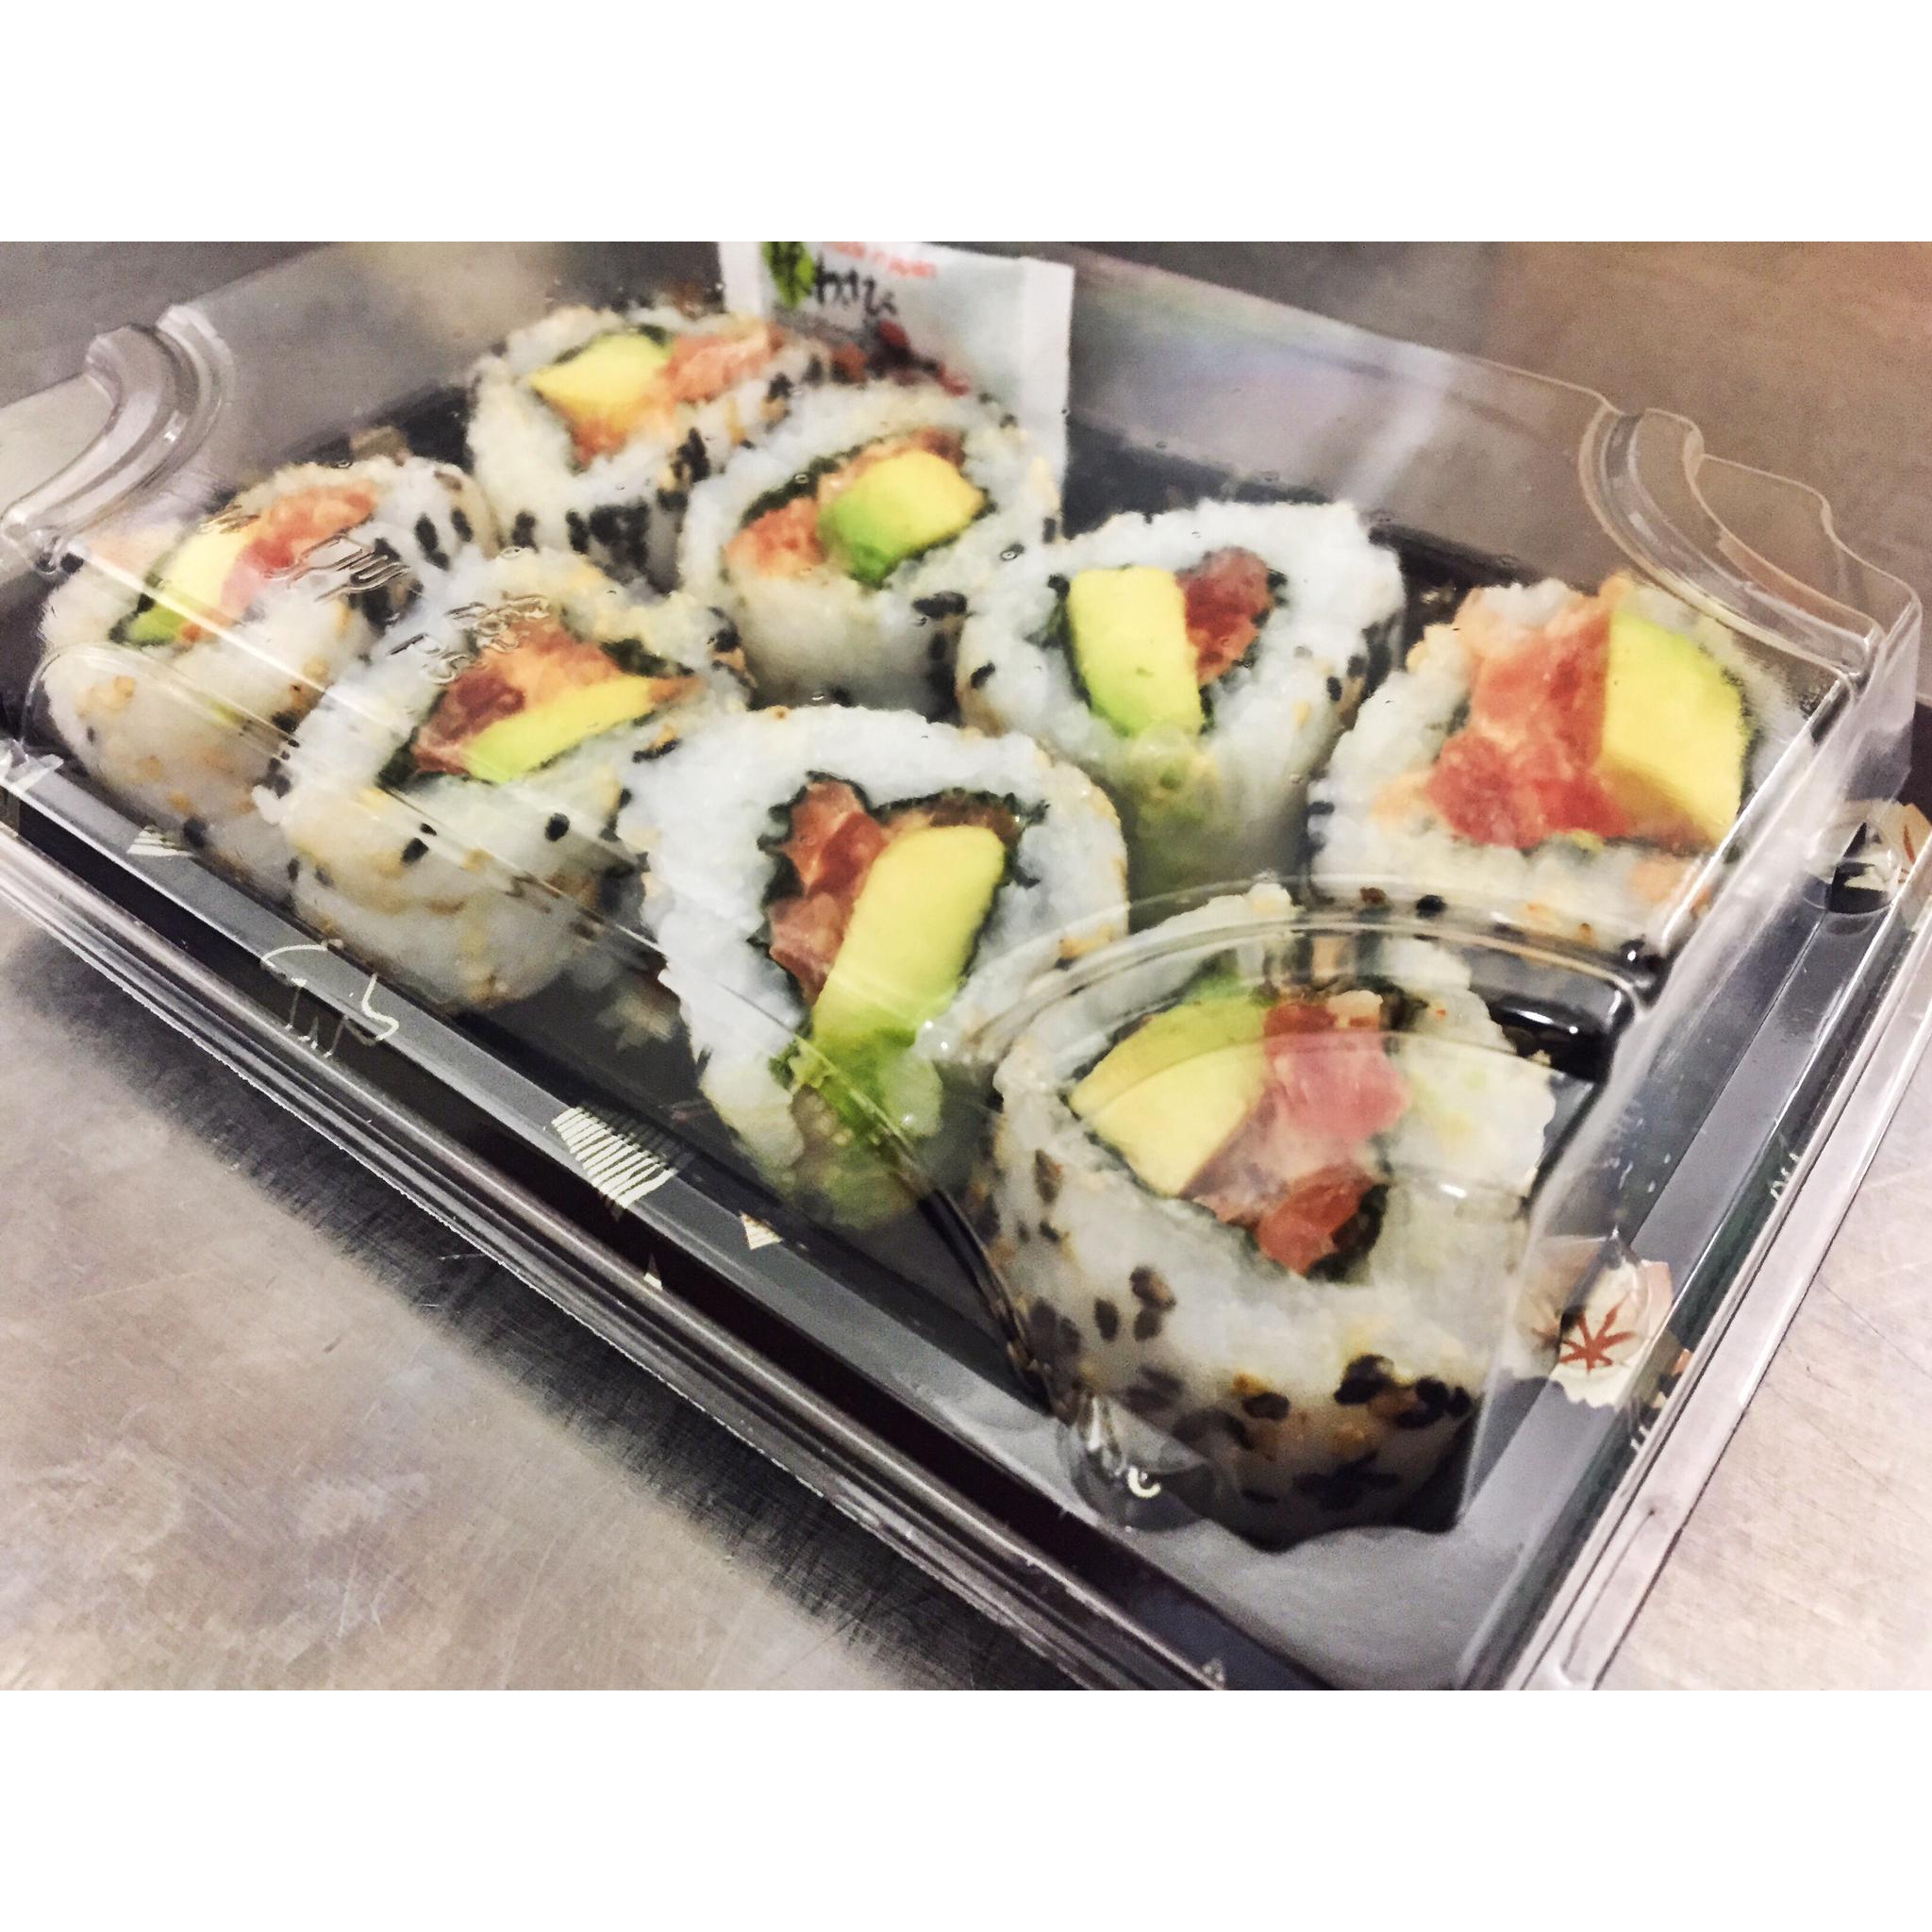 8 x Spicy Tuna Rolls - £7